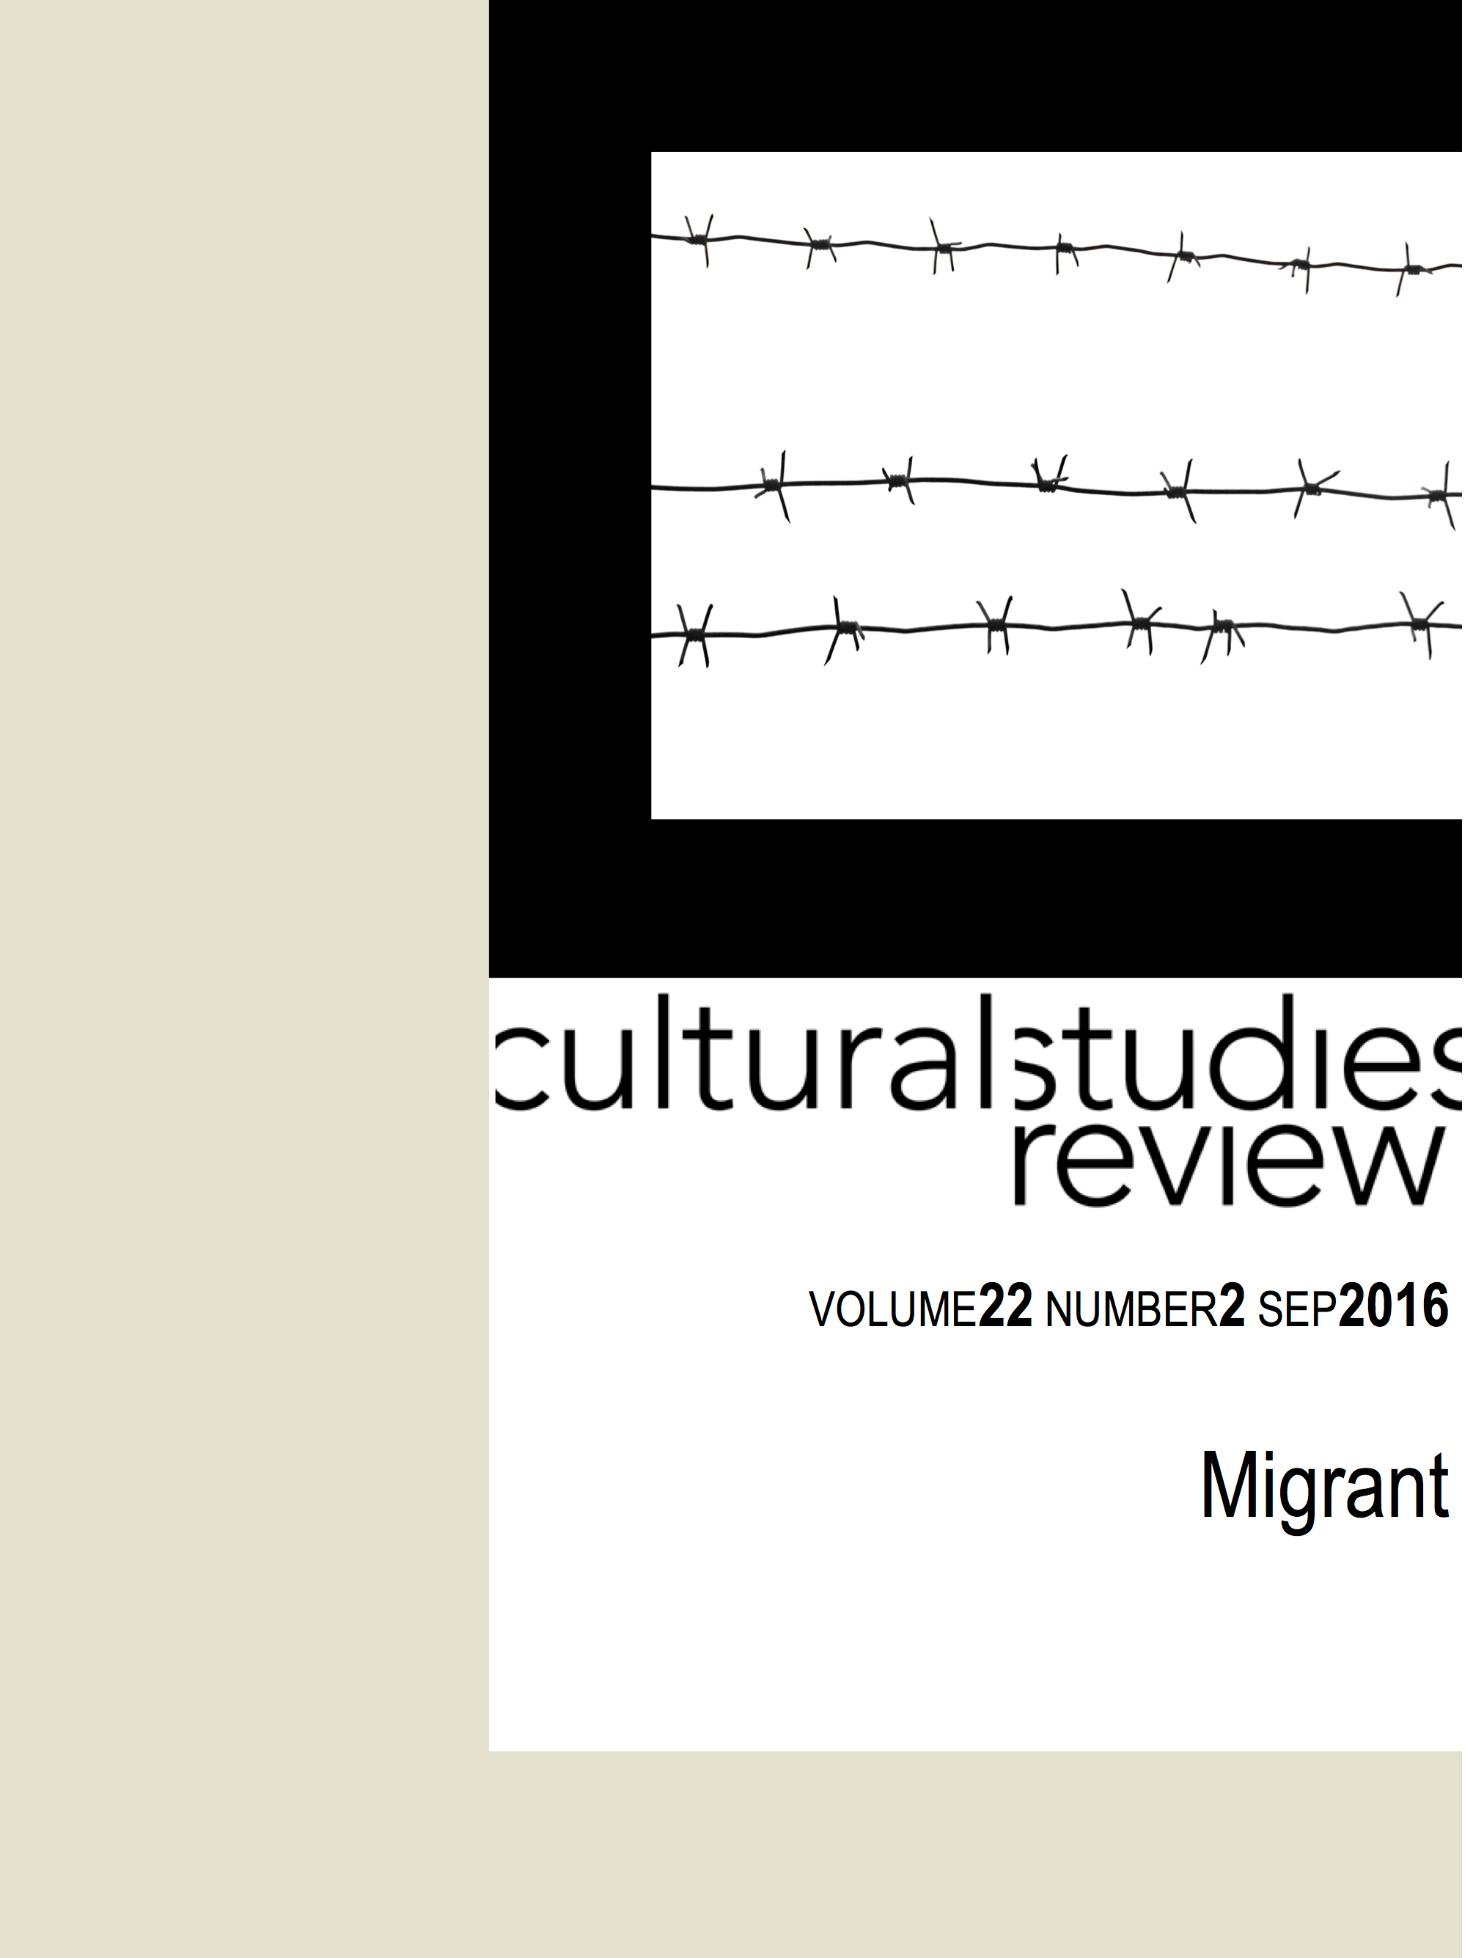 CSR 2016 Migrant- cover